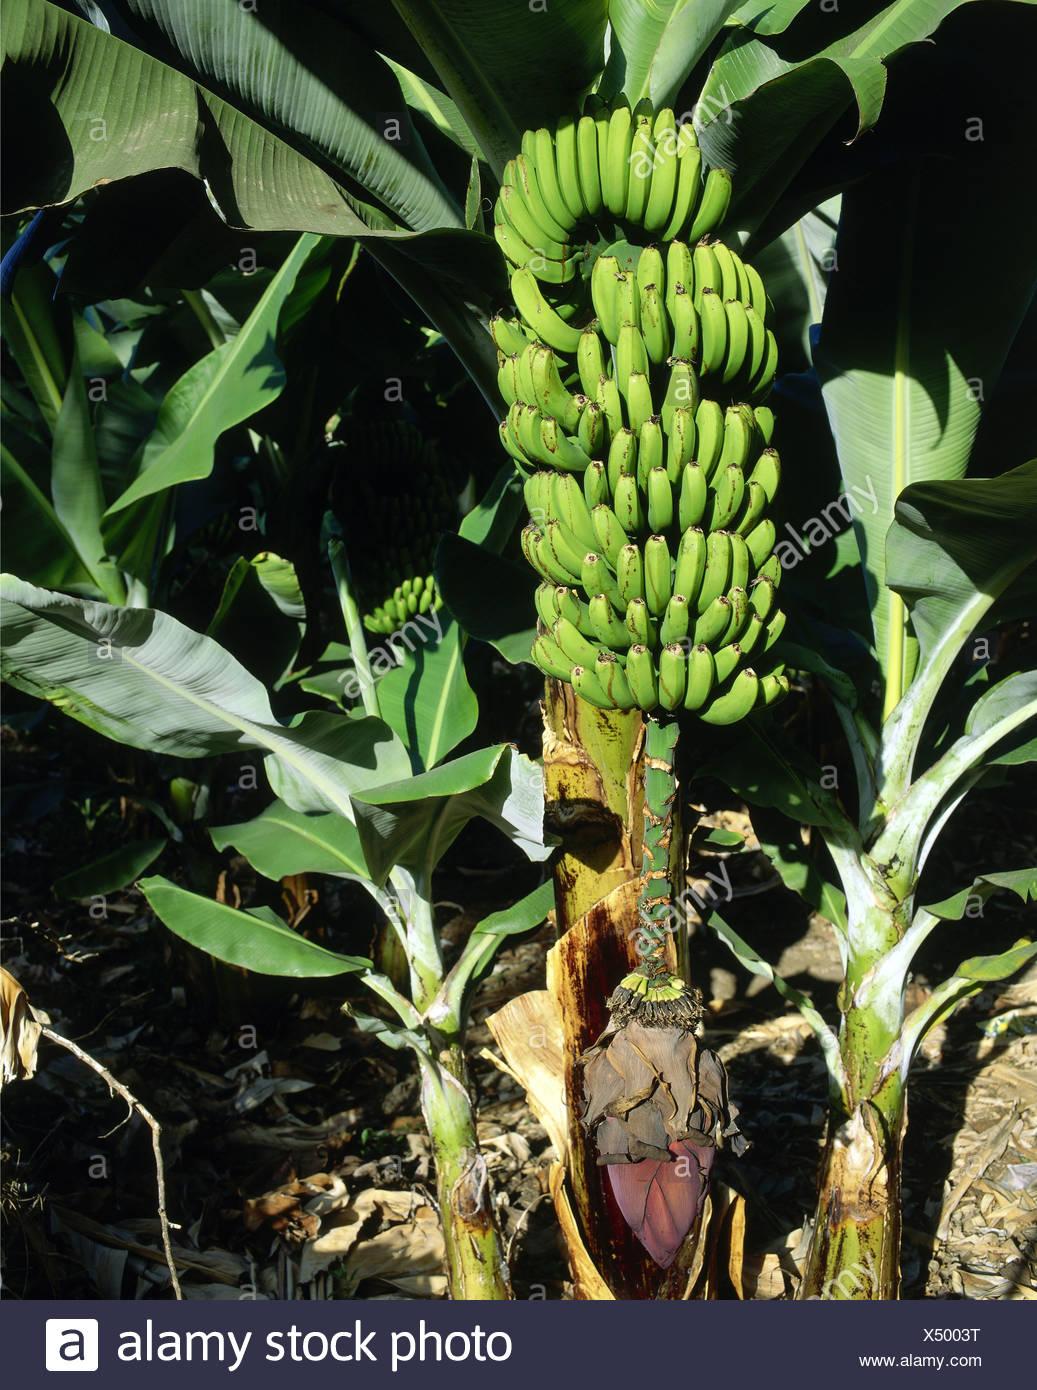 botany, banana, (Musa paradisiaca sapientum), bananas, perennial, blossom with tree, Teneriffe, Spain, Additional-Rights-Clearance-Info-Not-Available - Stock Image